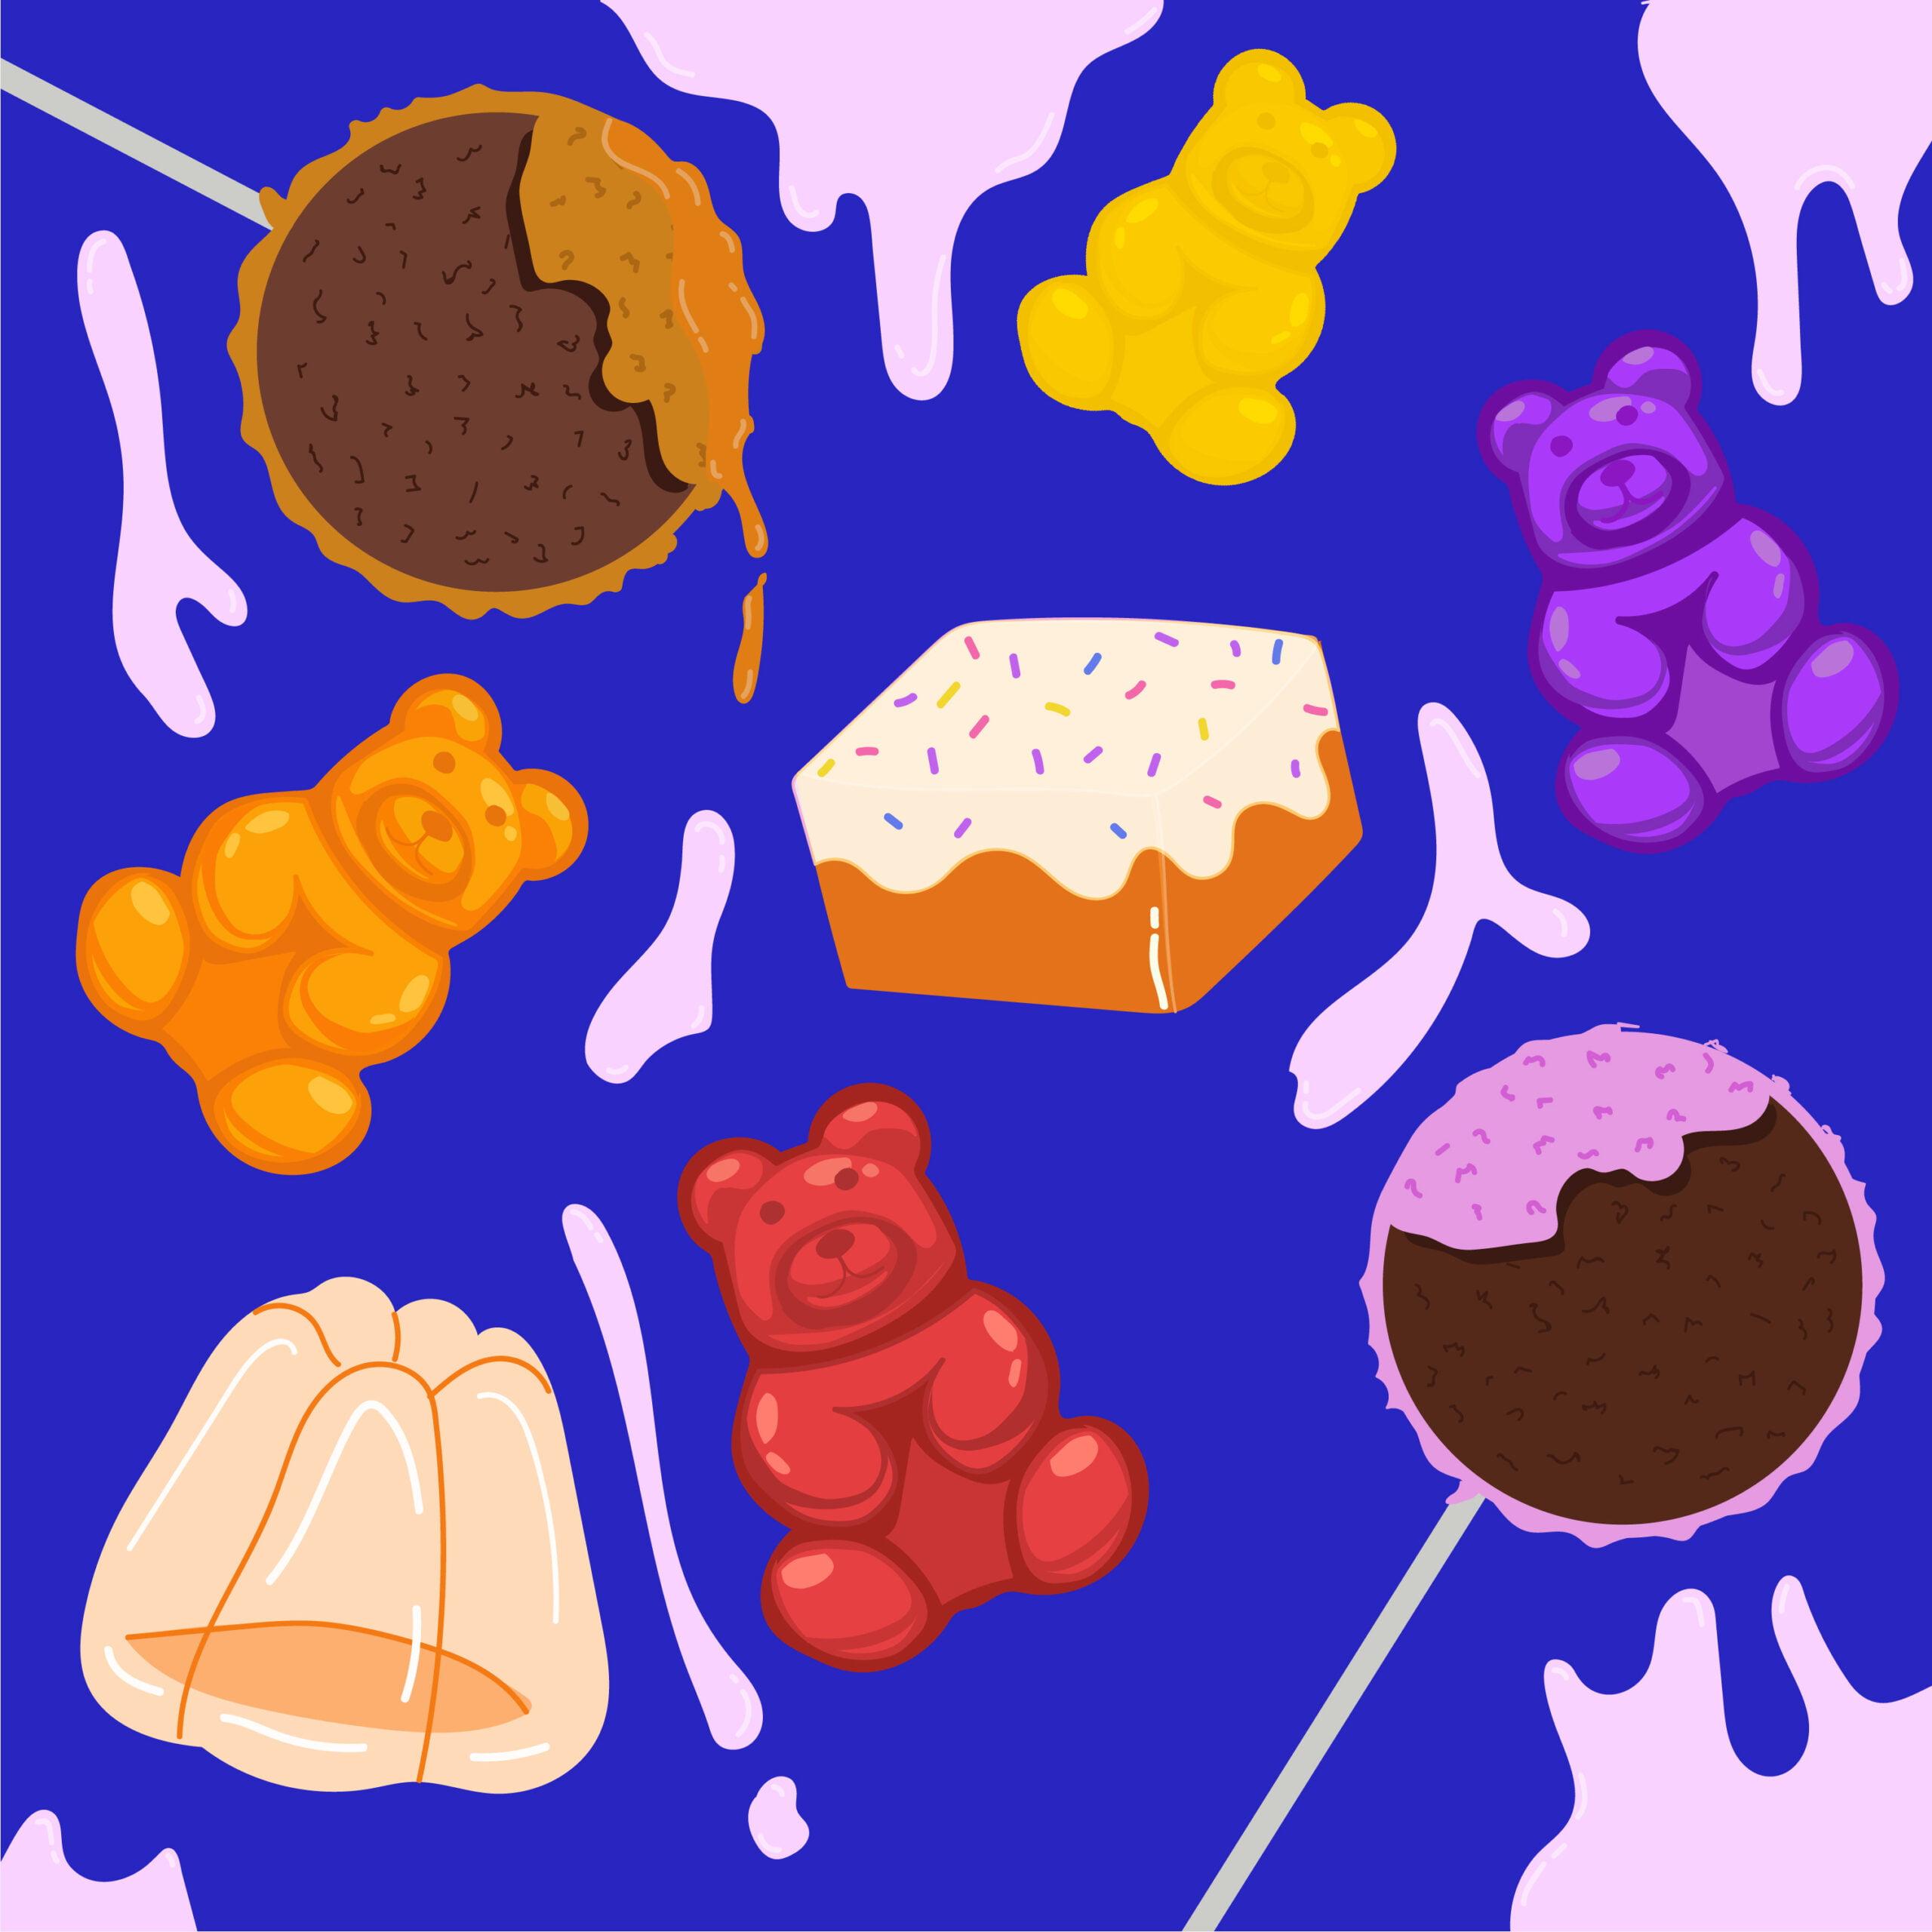 new candy illustration by Rita Azar by 360 Magazine